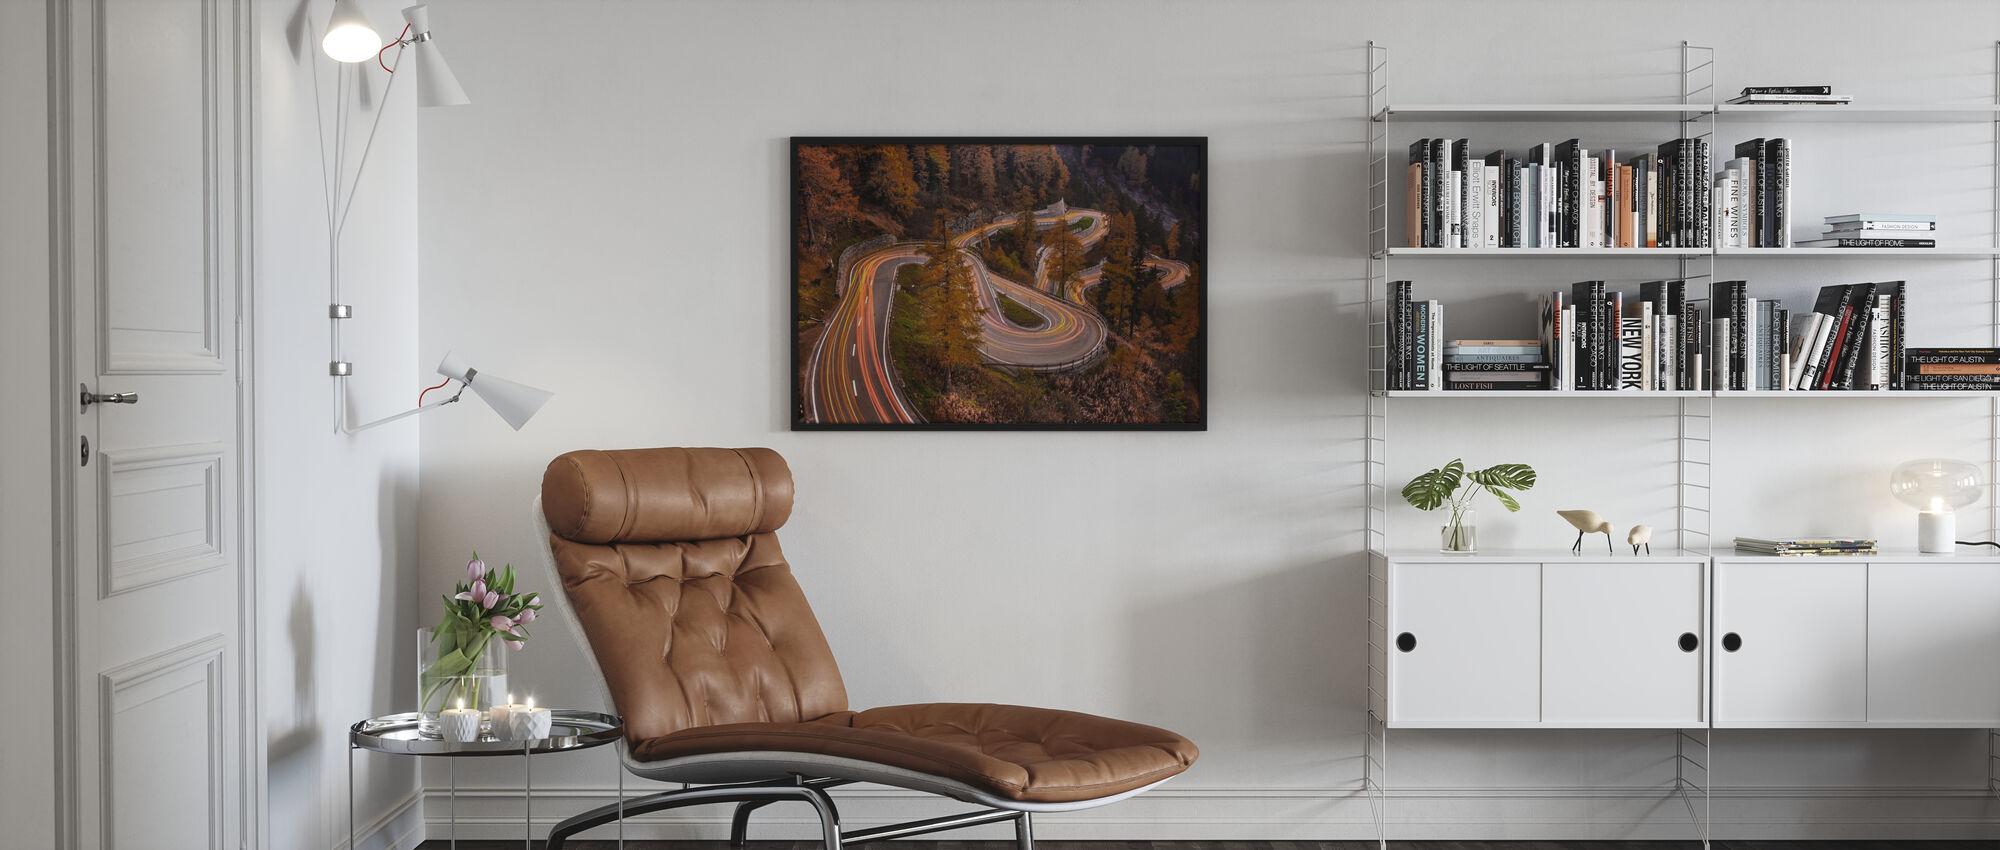 Freeway - Poster - Living Room